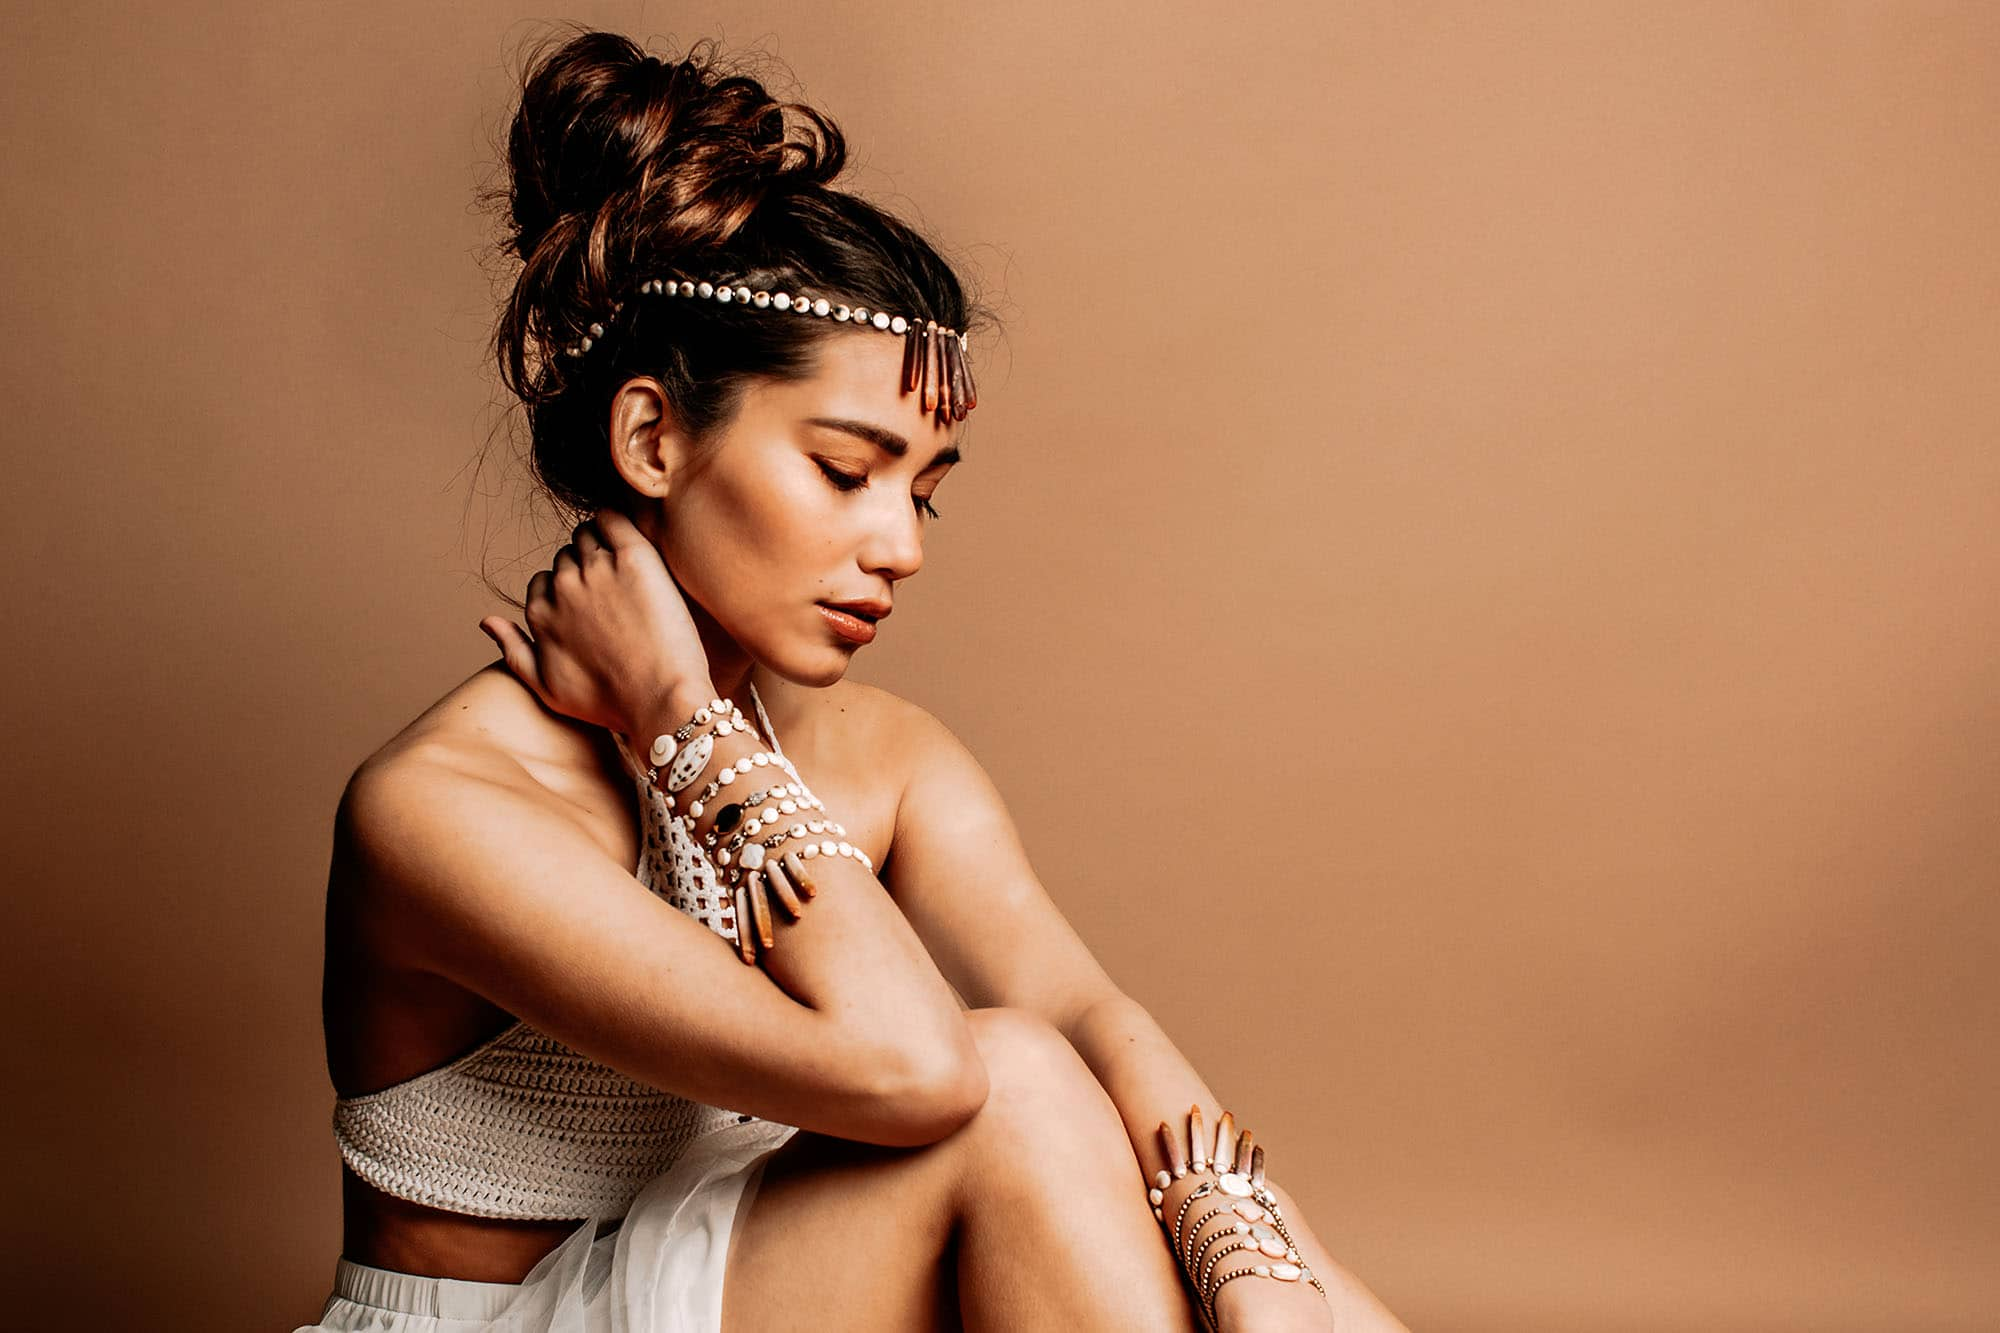 Fashion fotografie by Fotostudio Zandvoort